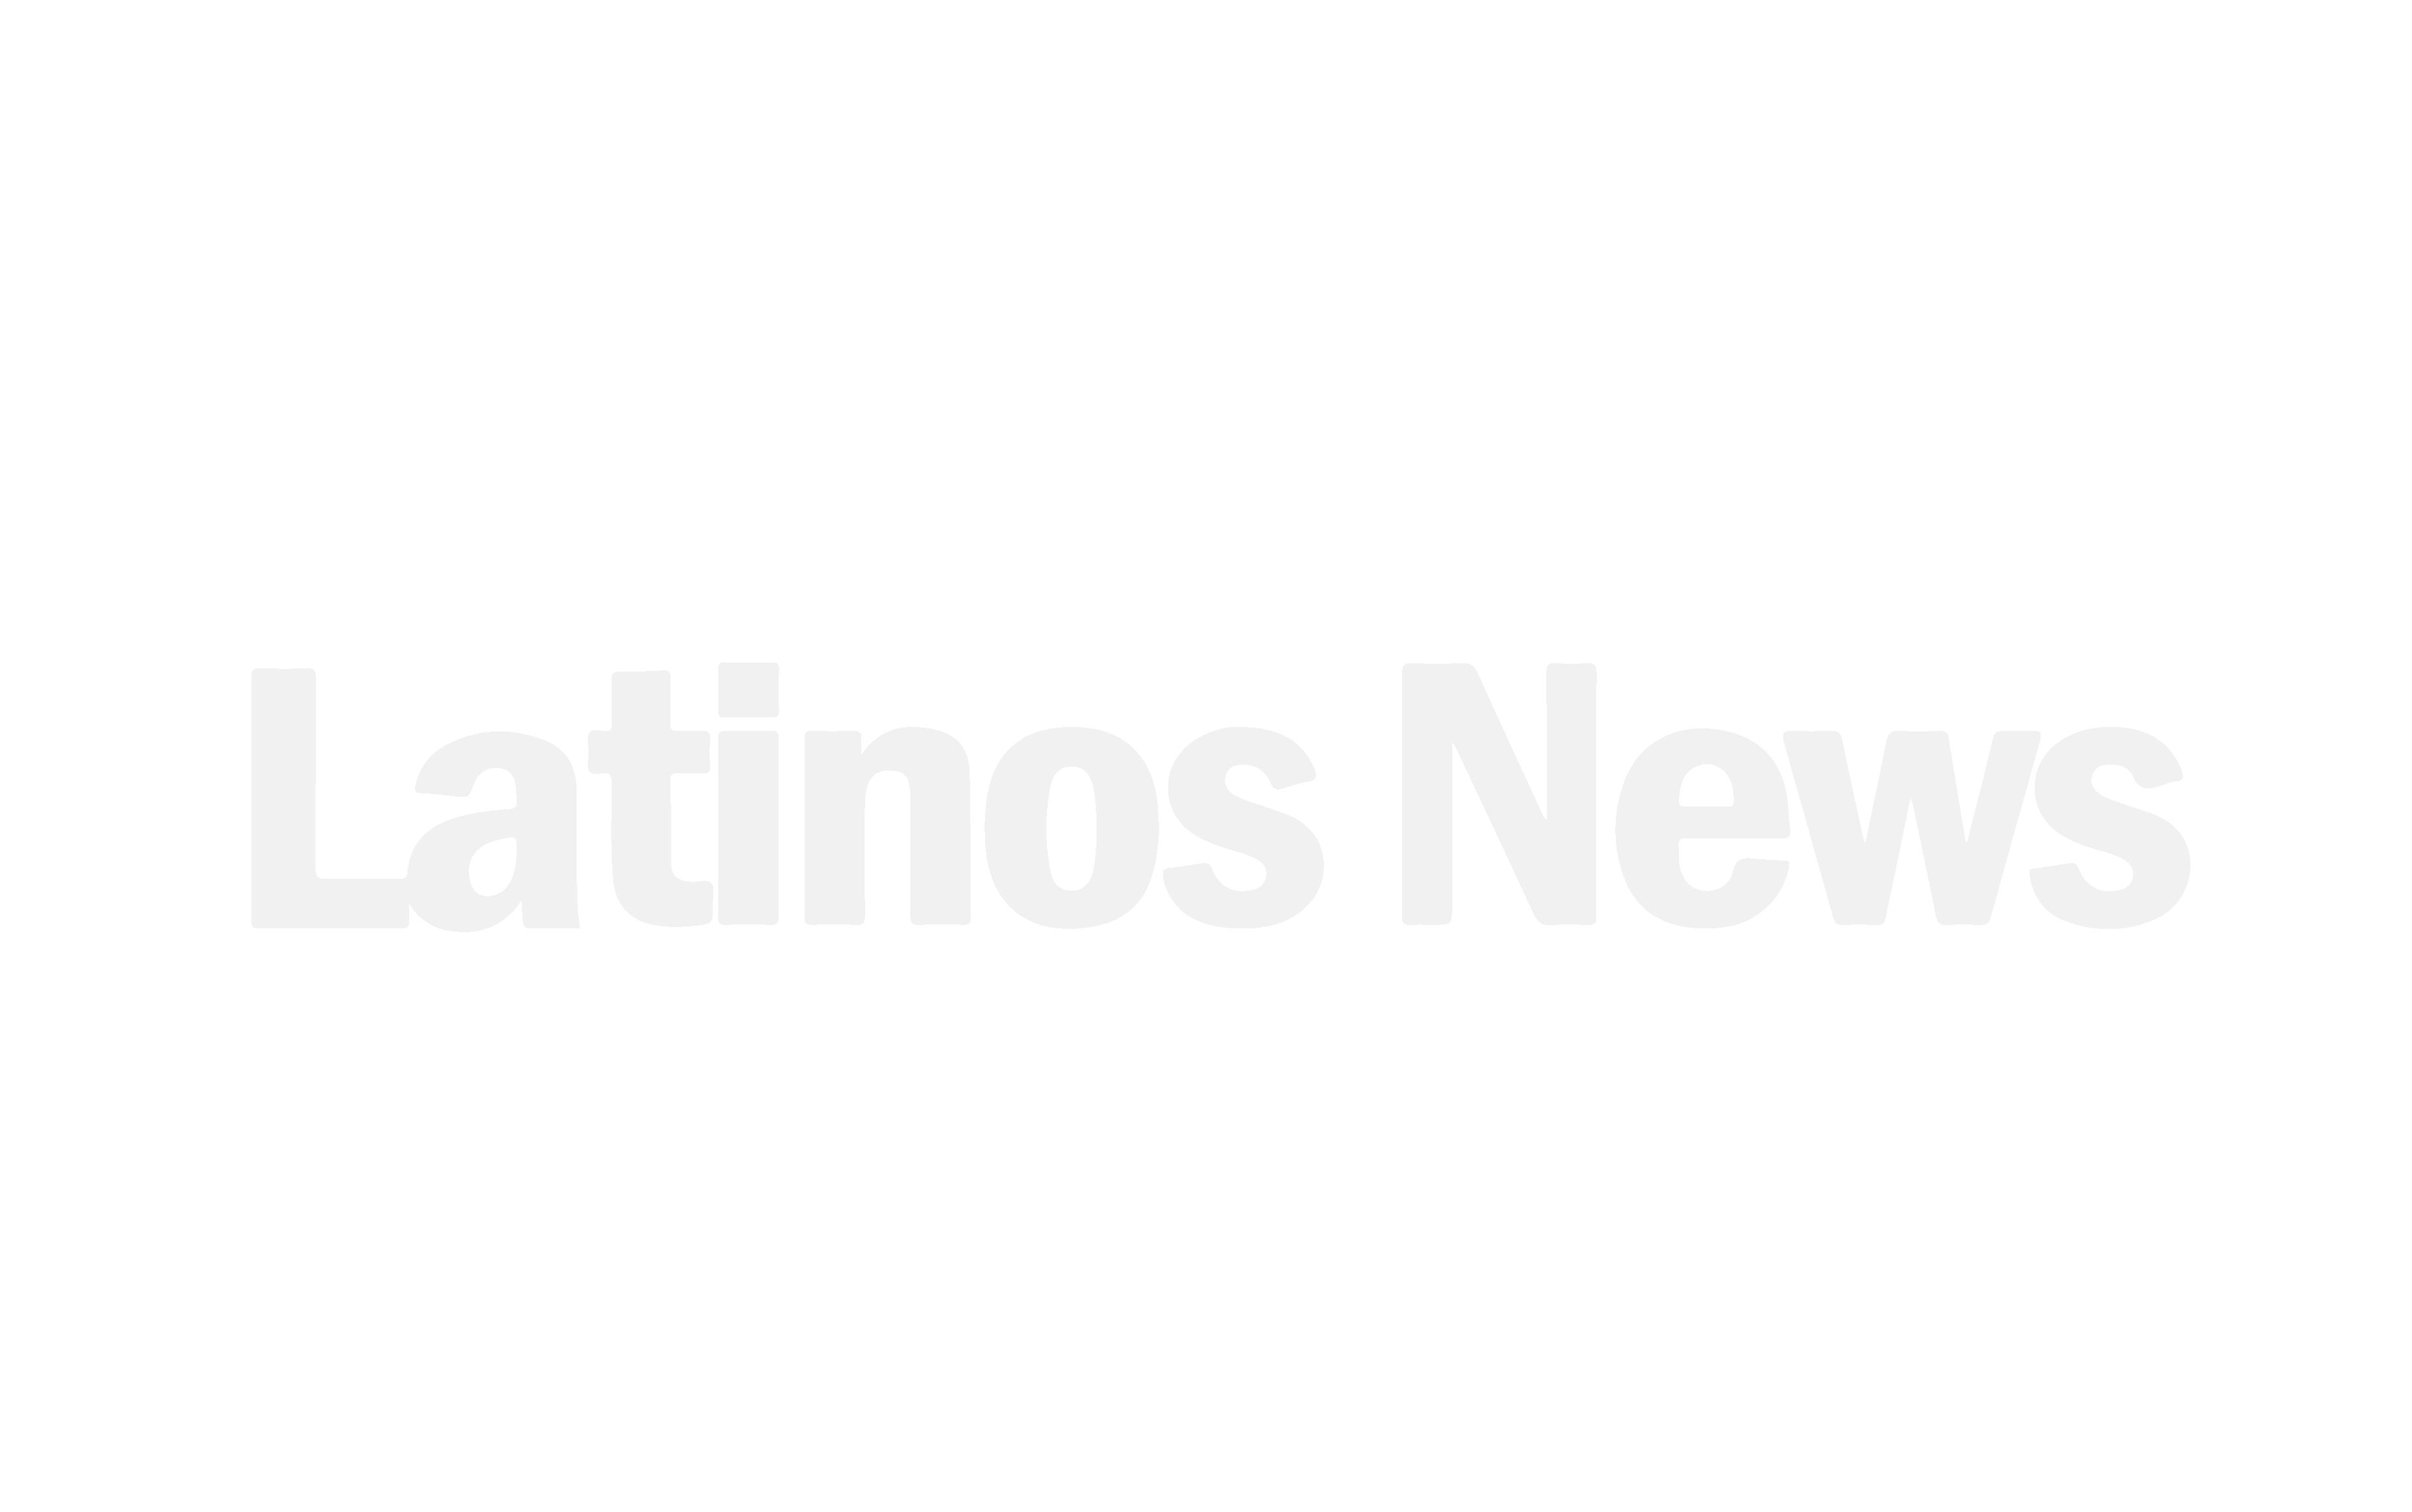 LATINOS NEWS FEATURE